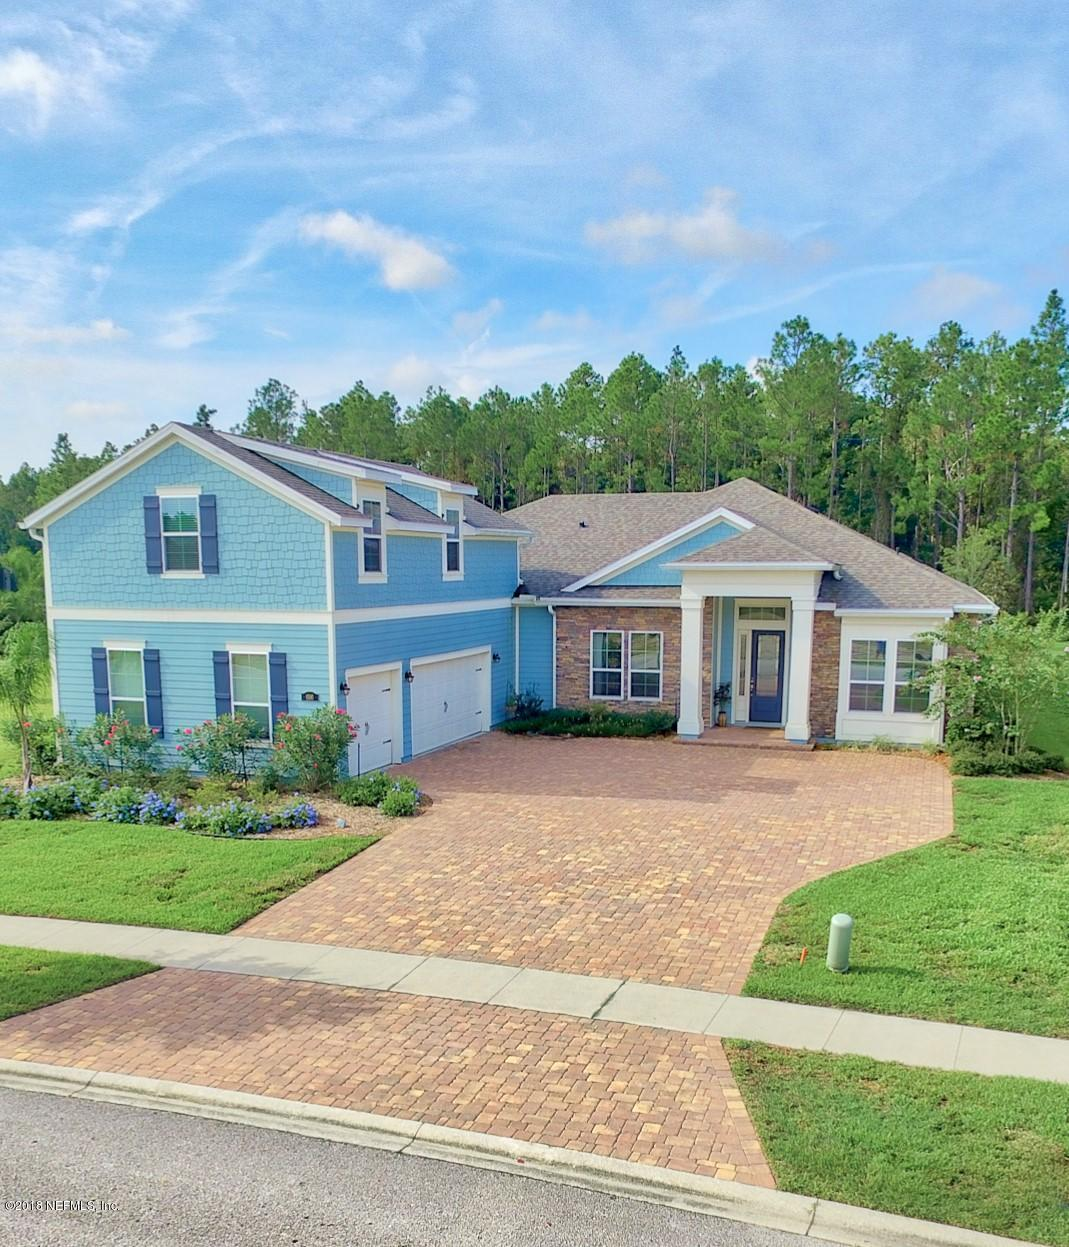 606 ENREDE, ST AUGUSTINE, FLORIDA 32095, 5 Bedrooms Bedrooms, ,5 BathroomsBathrooms,Residential - single family,For sale,ENREDE,956474